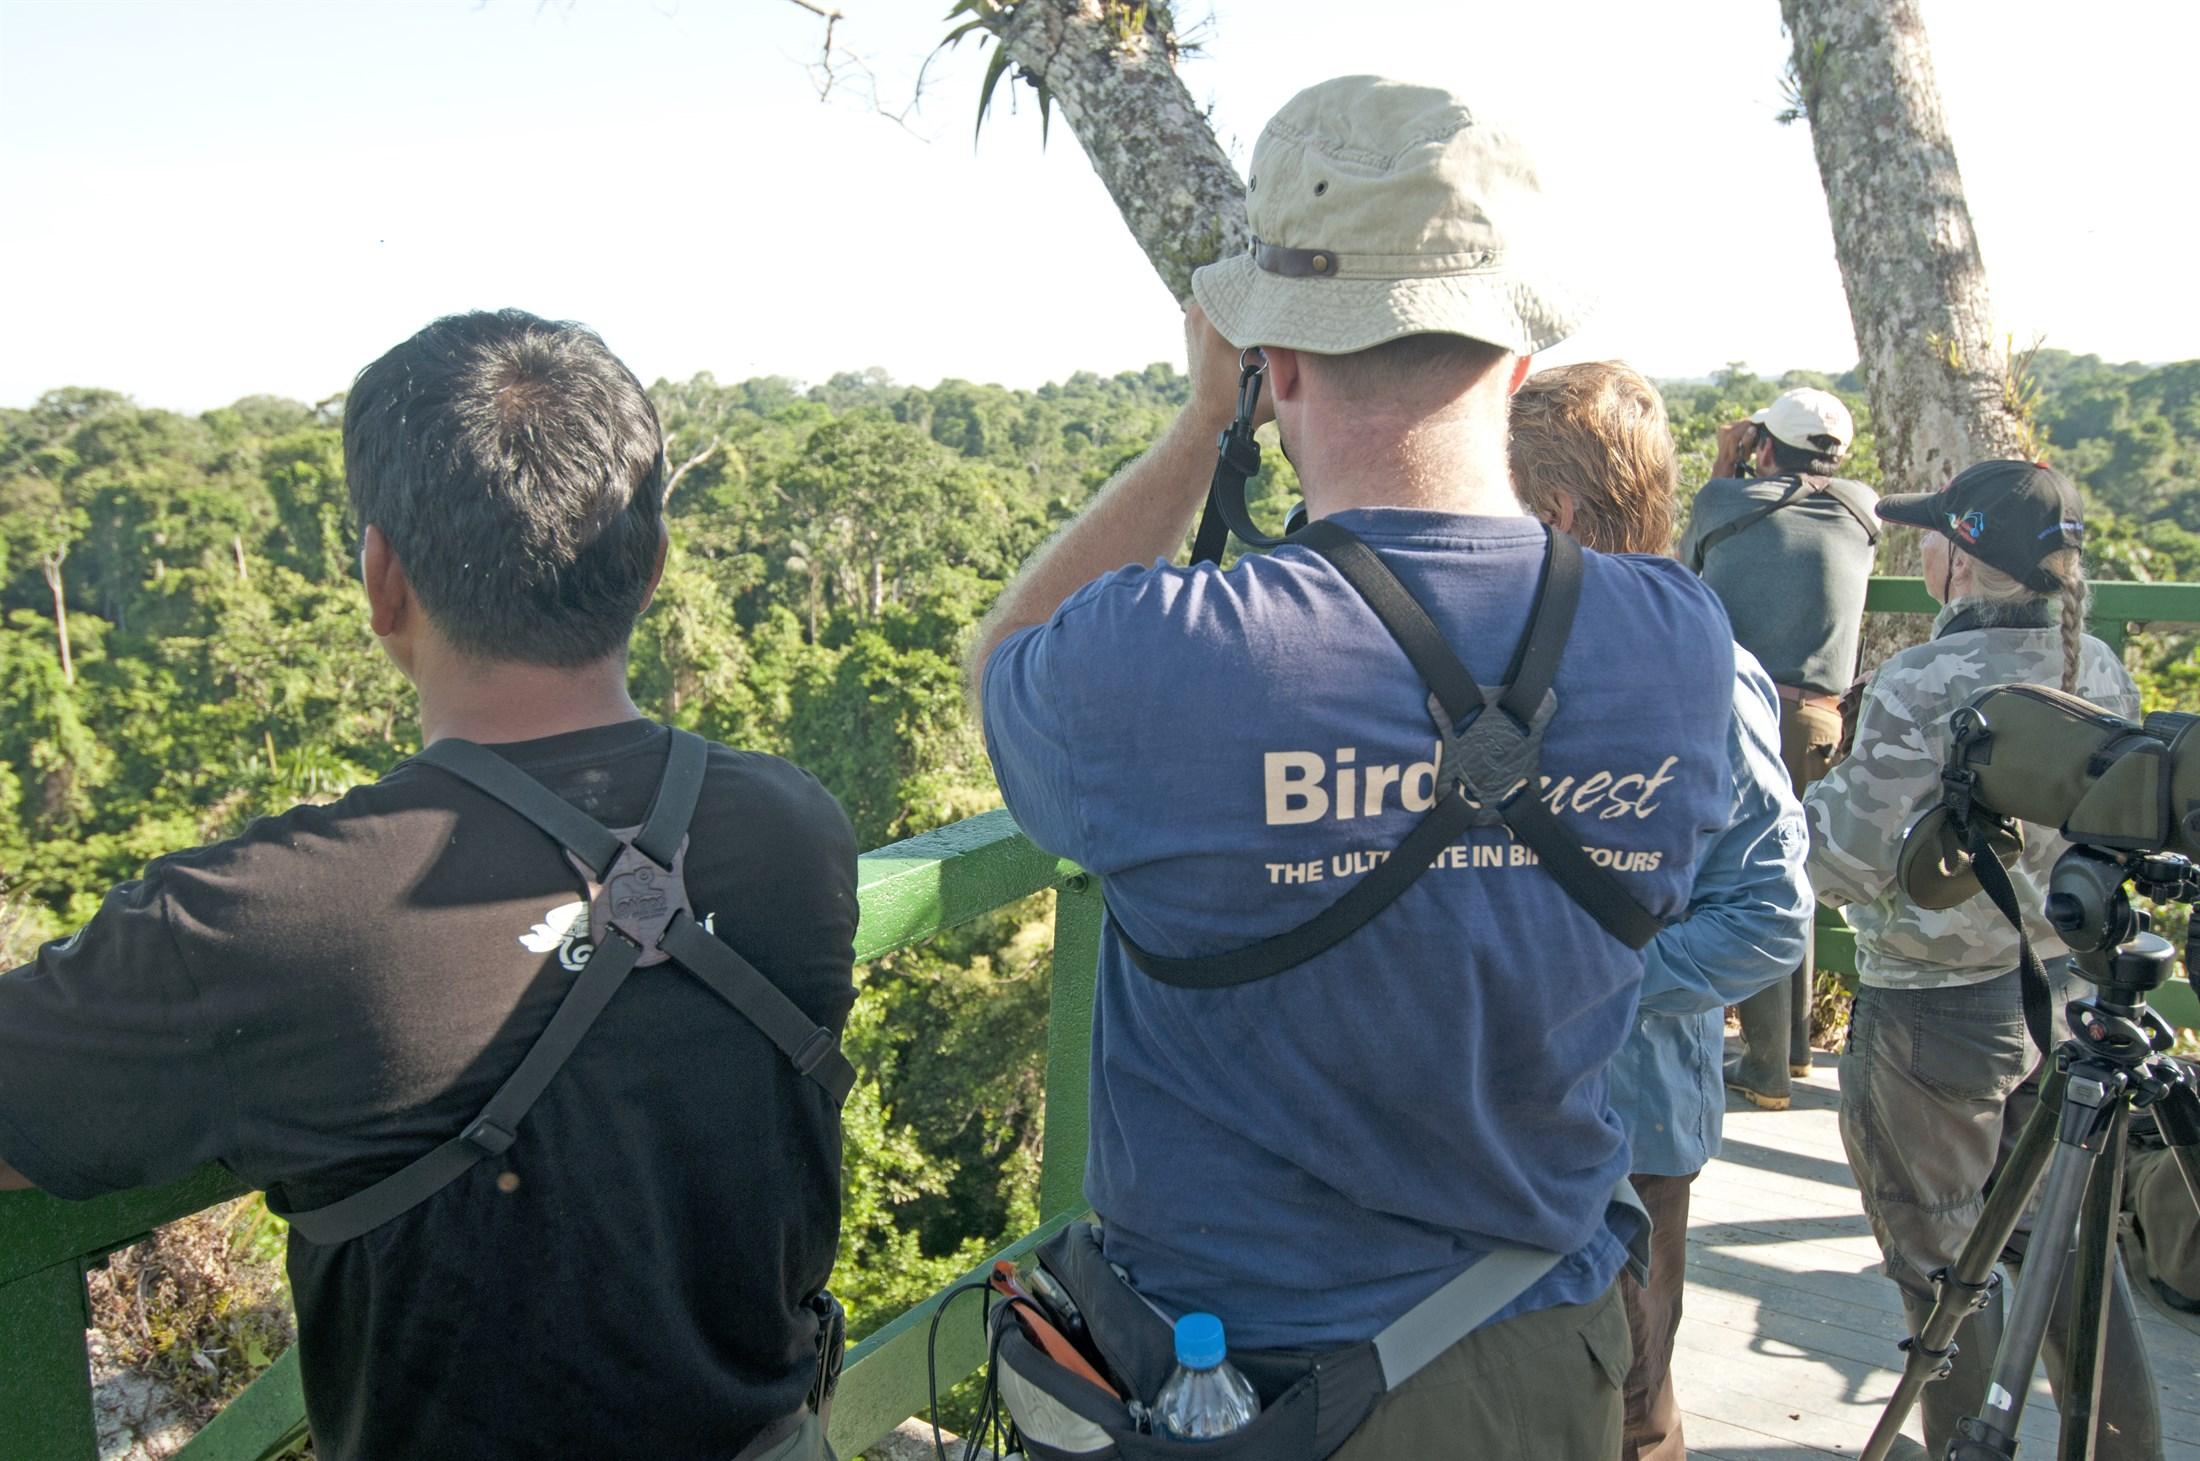 birders-in-amazone-rainforest-yasuni-national-park-ecuador_c7a6-2200x1461px